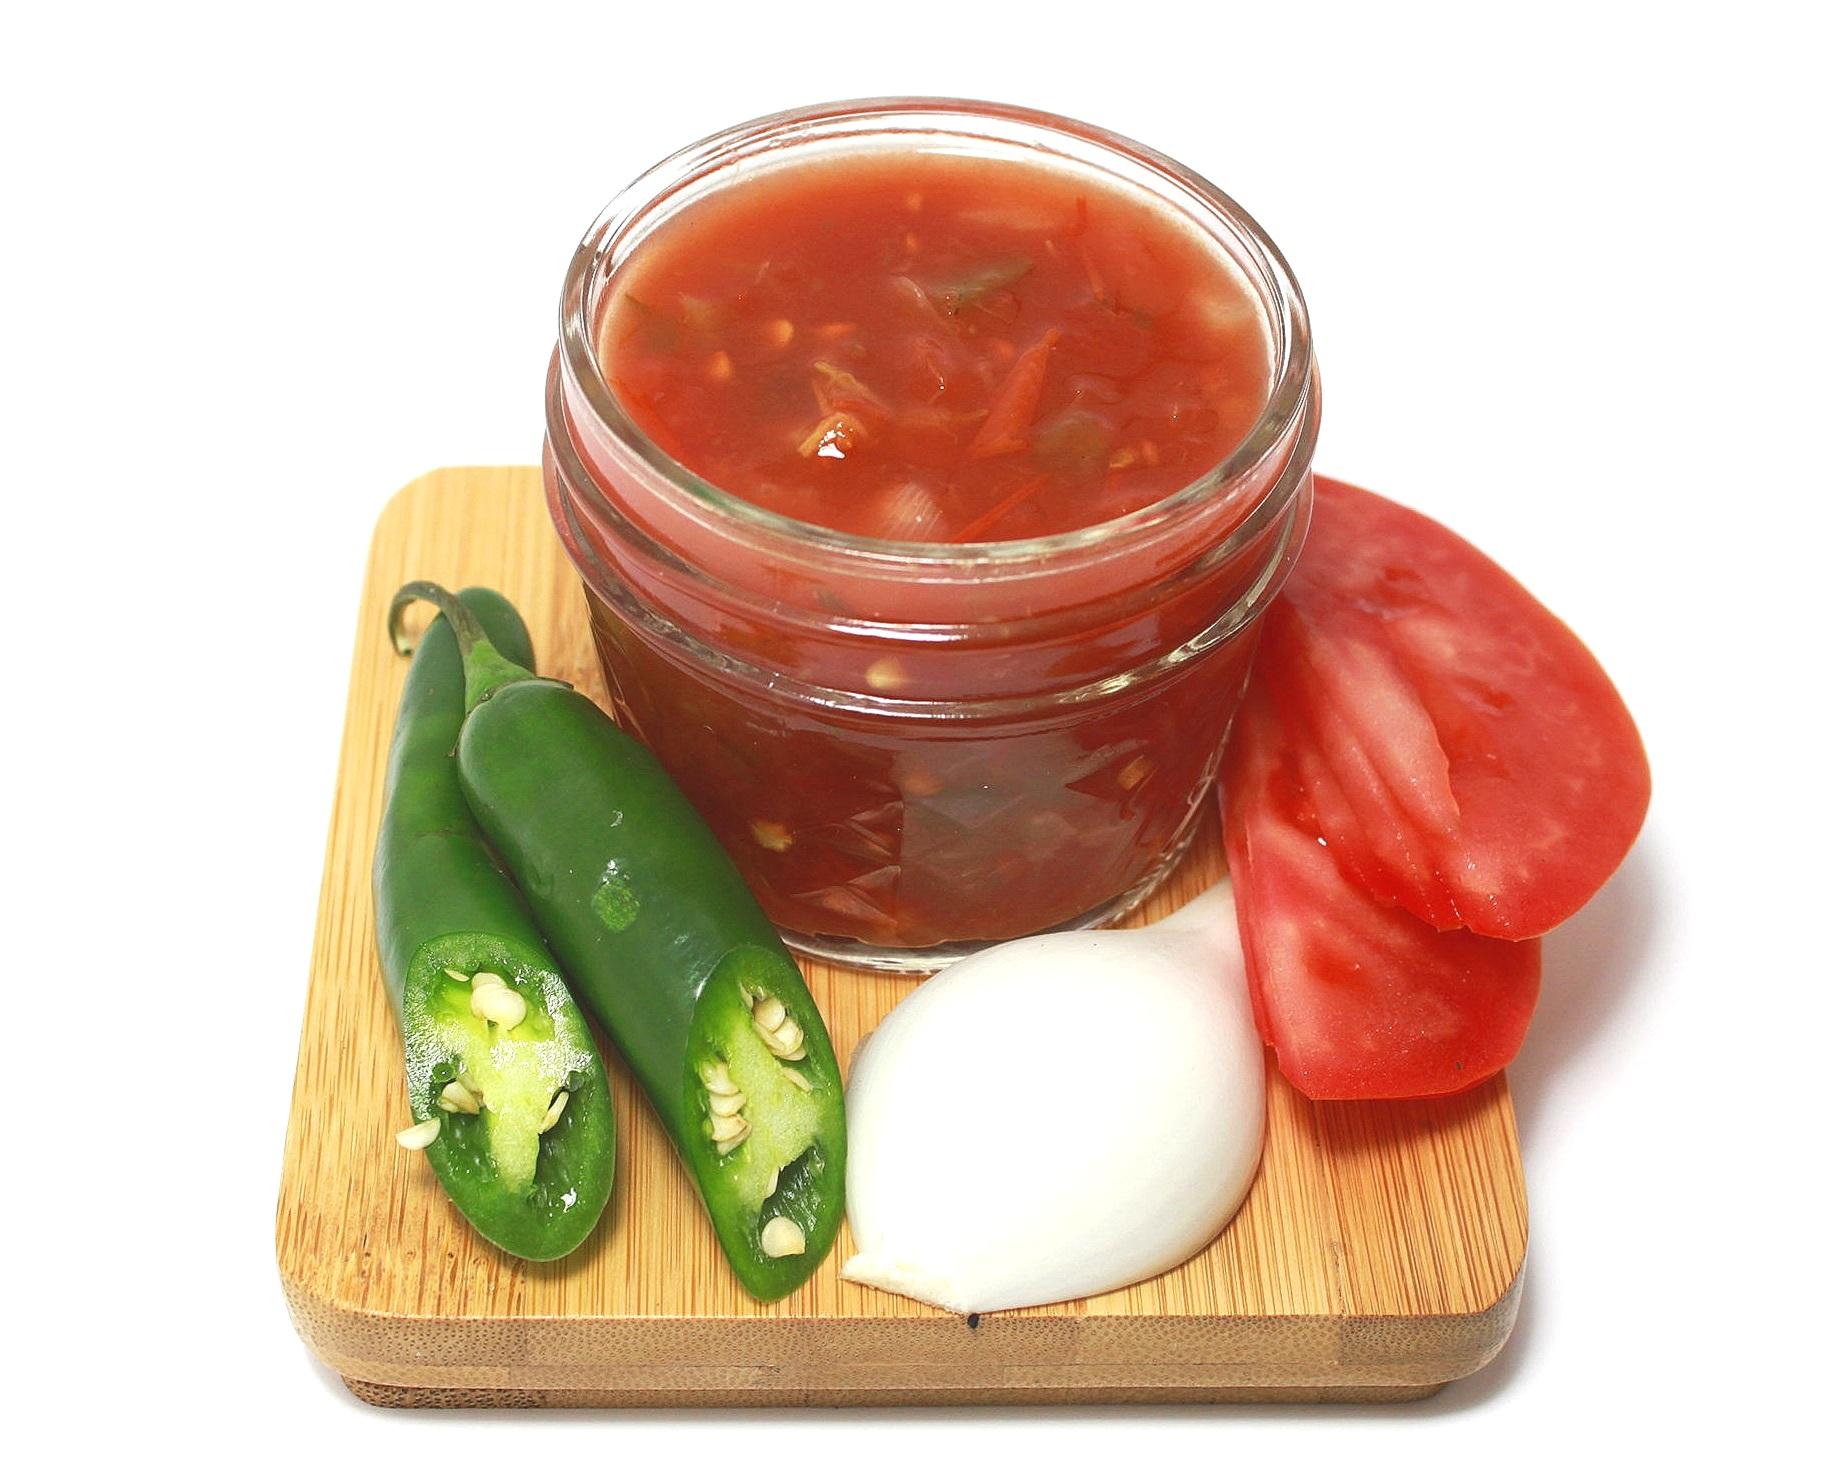 TEX MEX ROJA - Tomato, Onion, Jalapeno, Cumin.